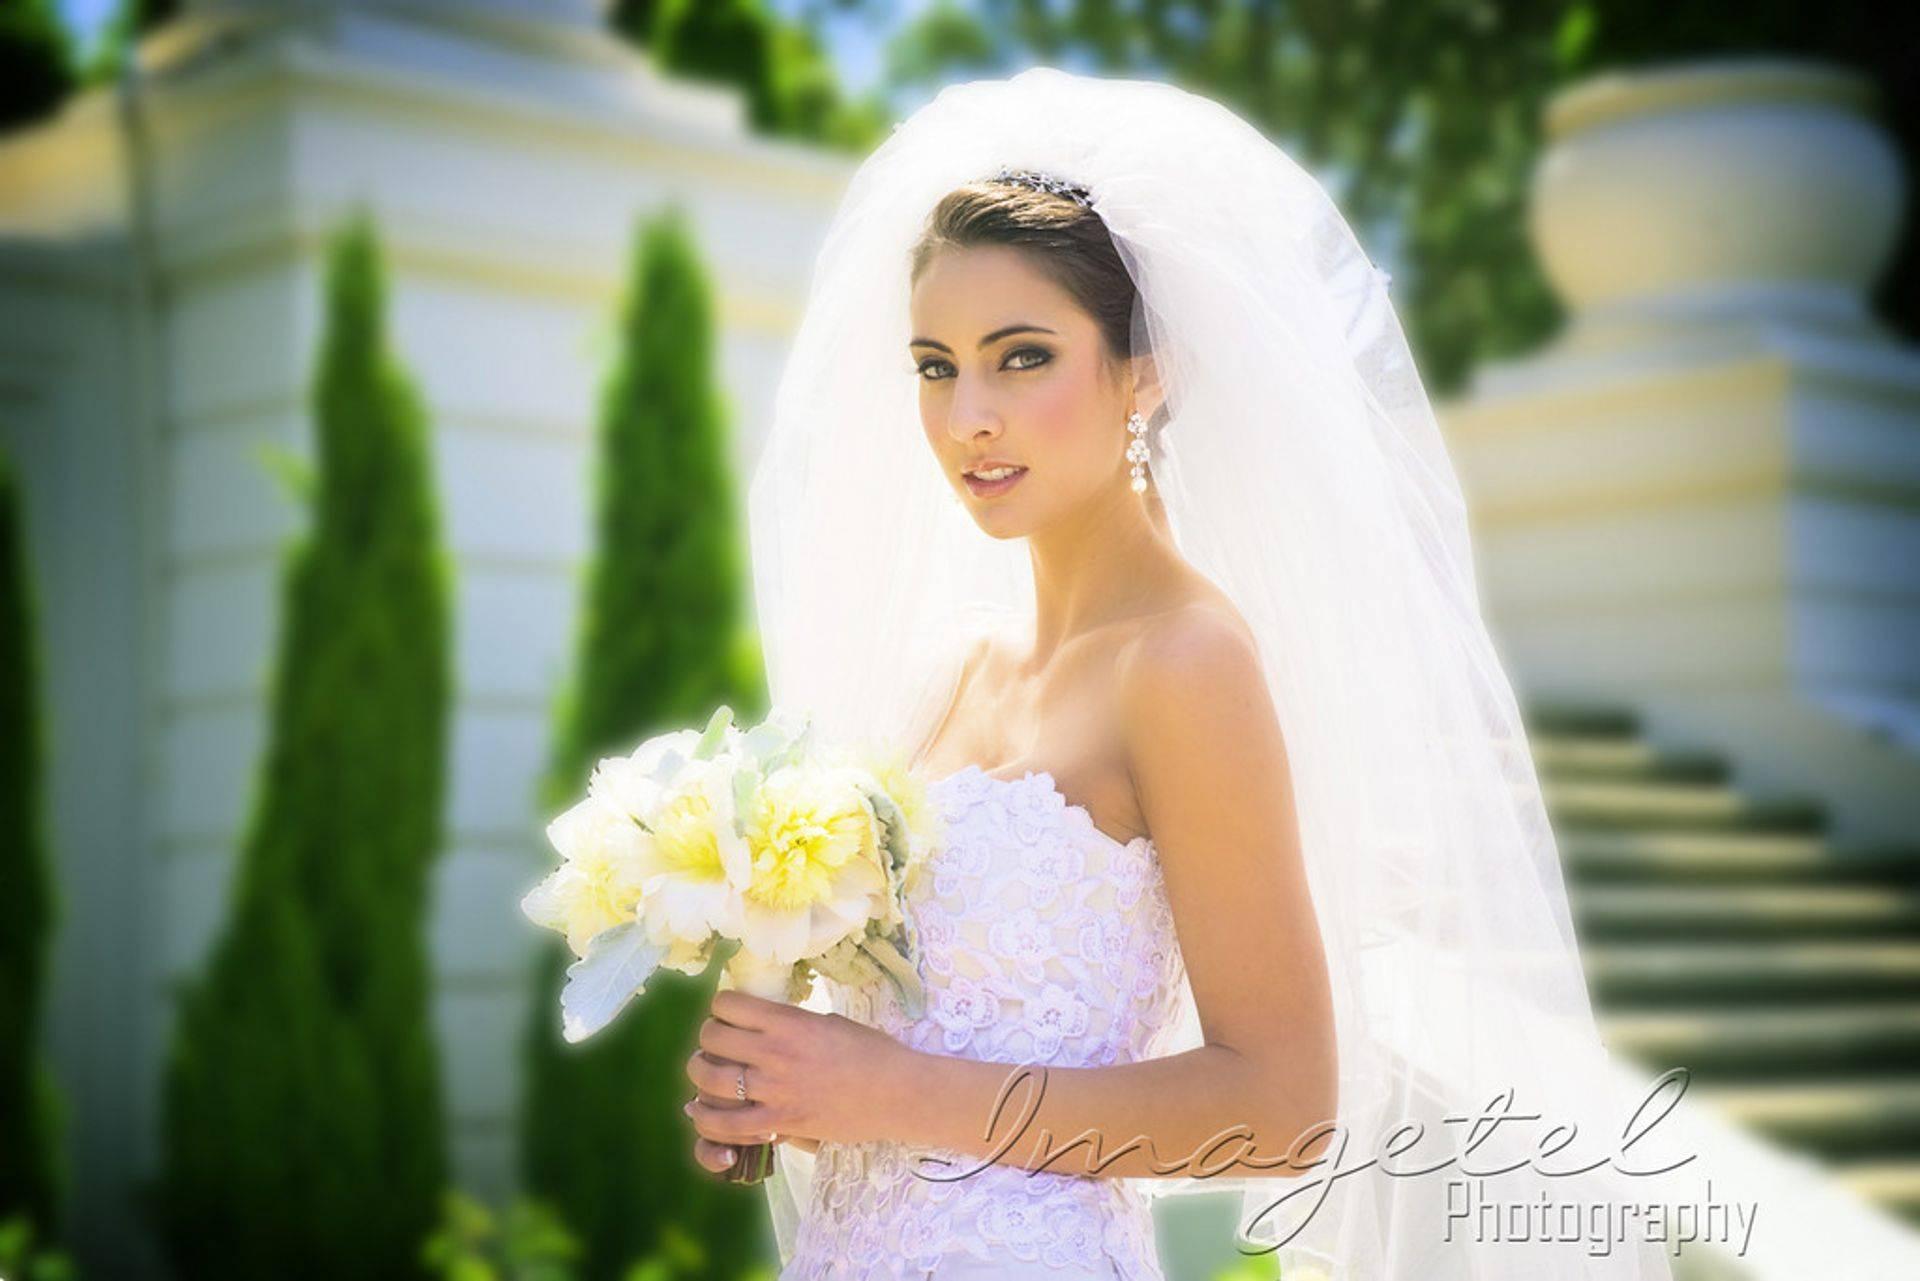 Bride with a Purpose